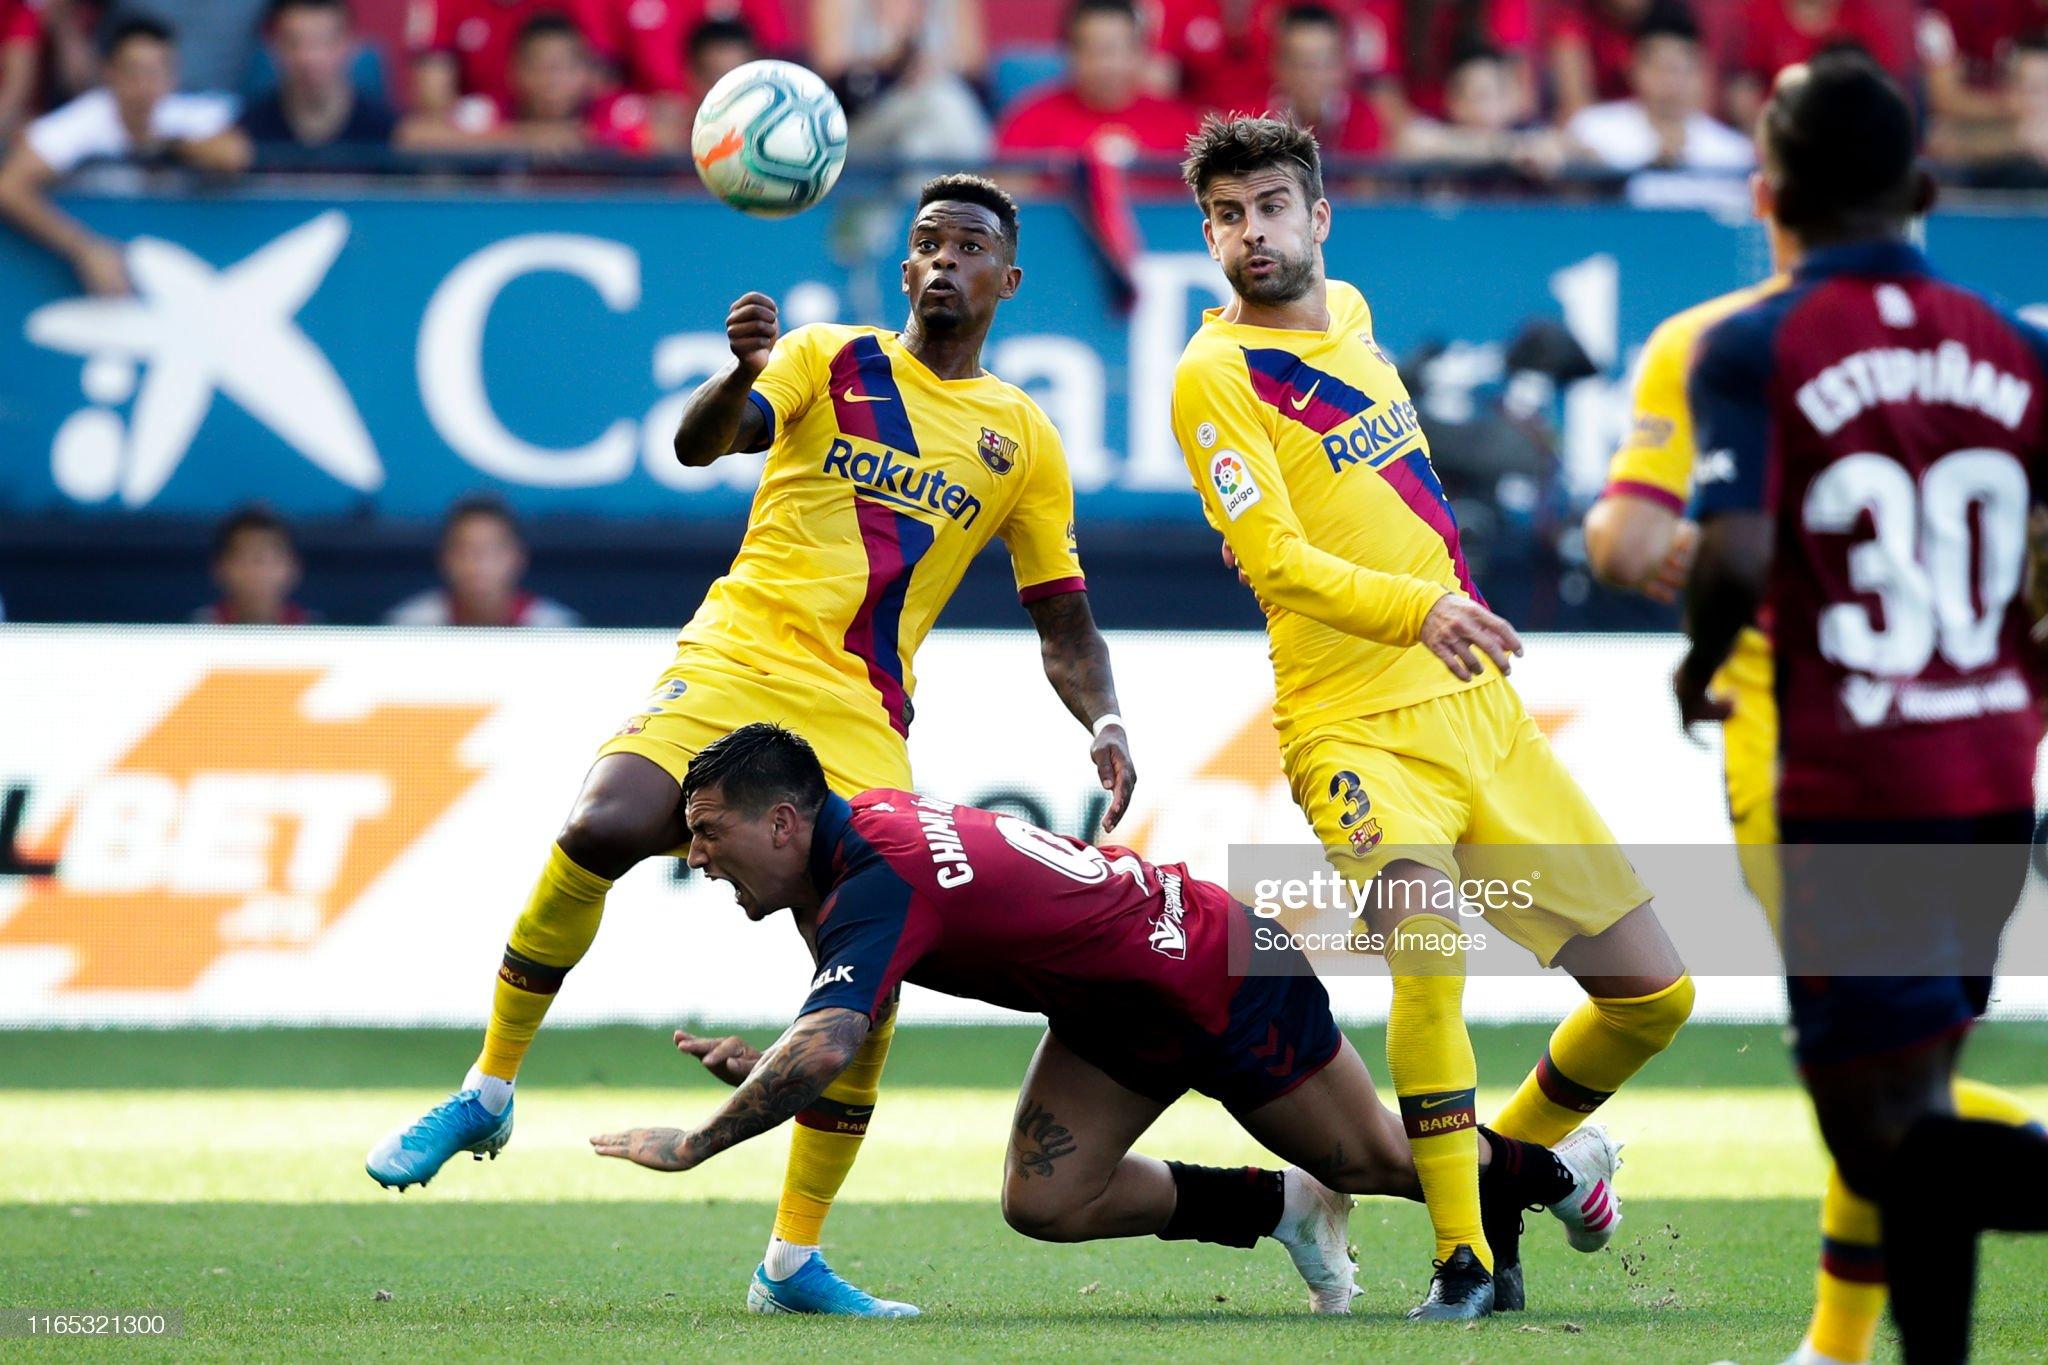 صور مباراة : أوساسونا - برشلونة 2-2 ( 31-08-2019 )  Nelson-semedo-of-fc-barcelona-chimy-avila-of-ca-osasuna-gerard-pique-picture-id1165321300?s=2048x2048